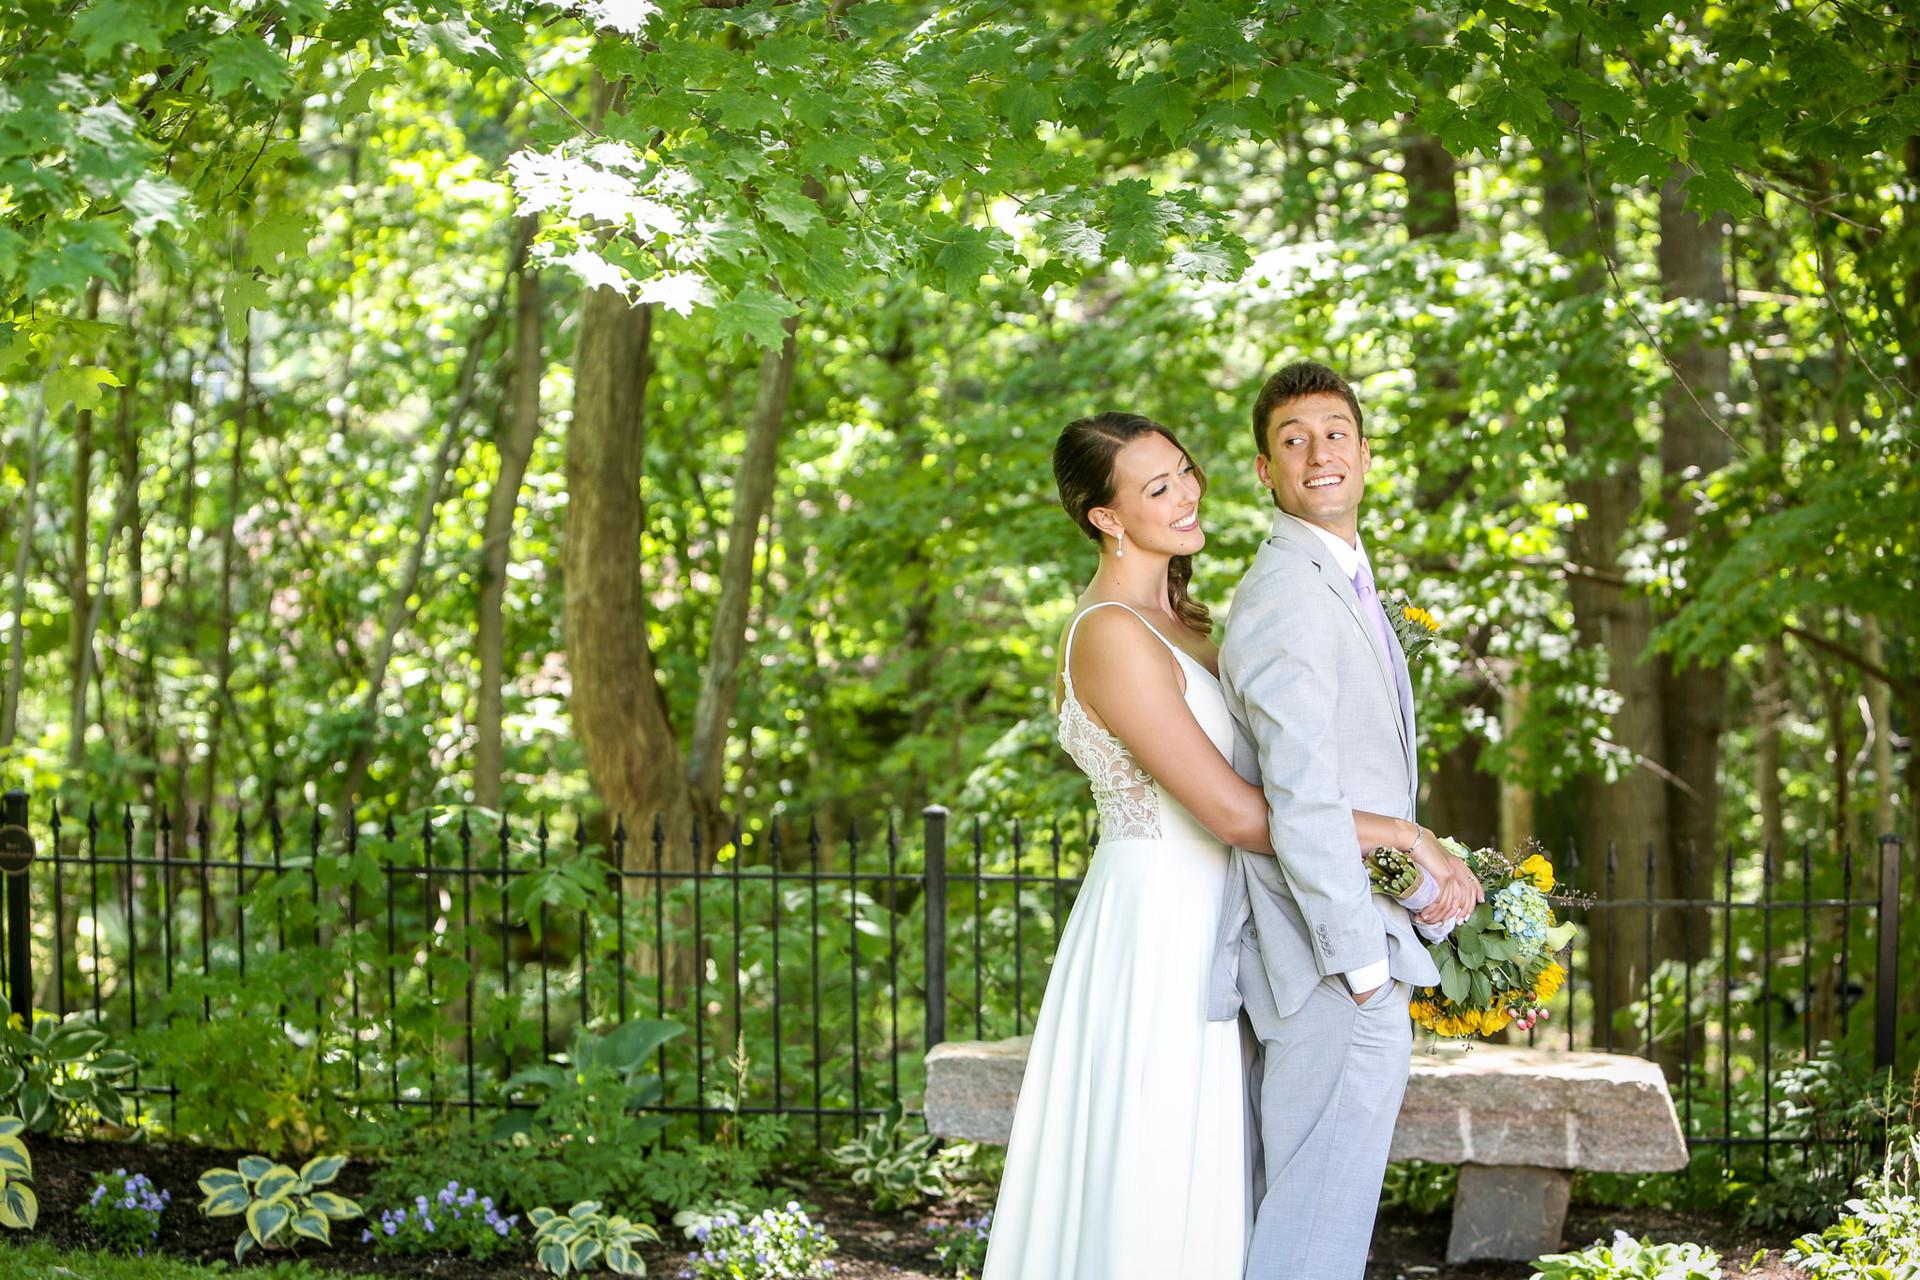 Jenna & Ethan (323 of 653).jpg